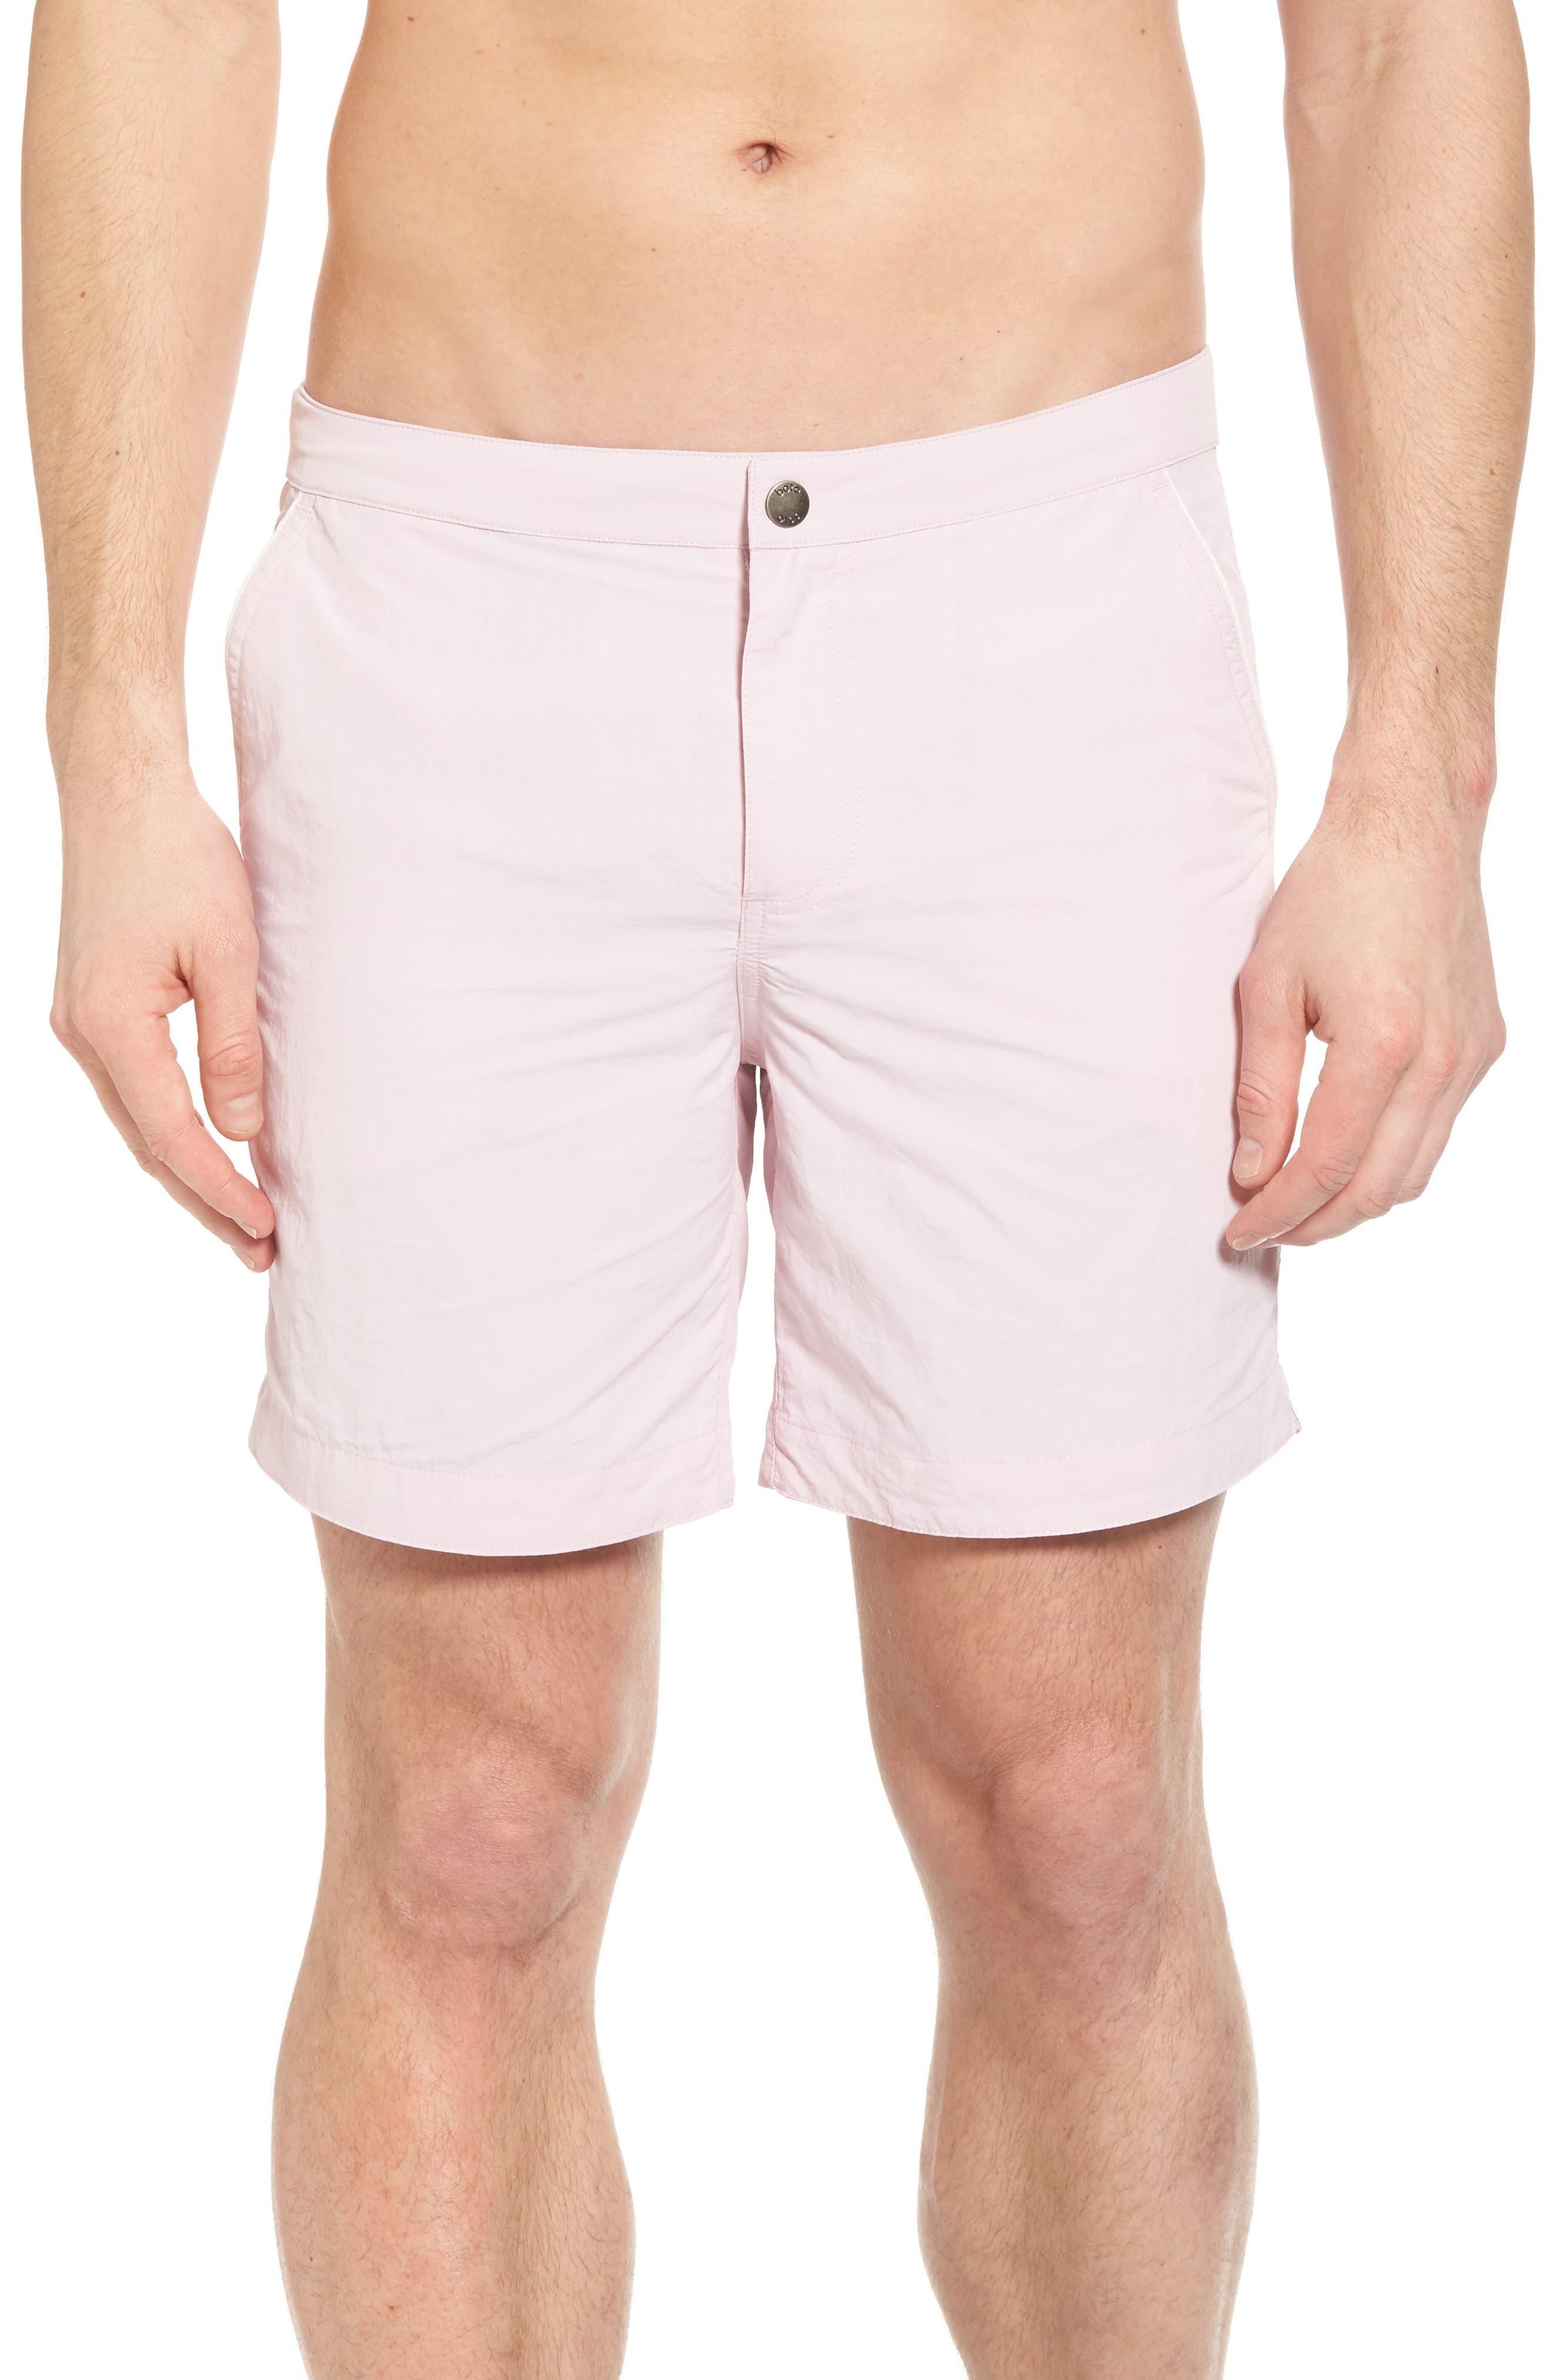 Rio Regular Fit Swim Trunks,                             Main thumbnail 1, color,                             Pastel Pink Solid